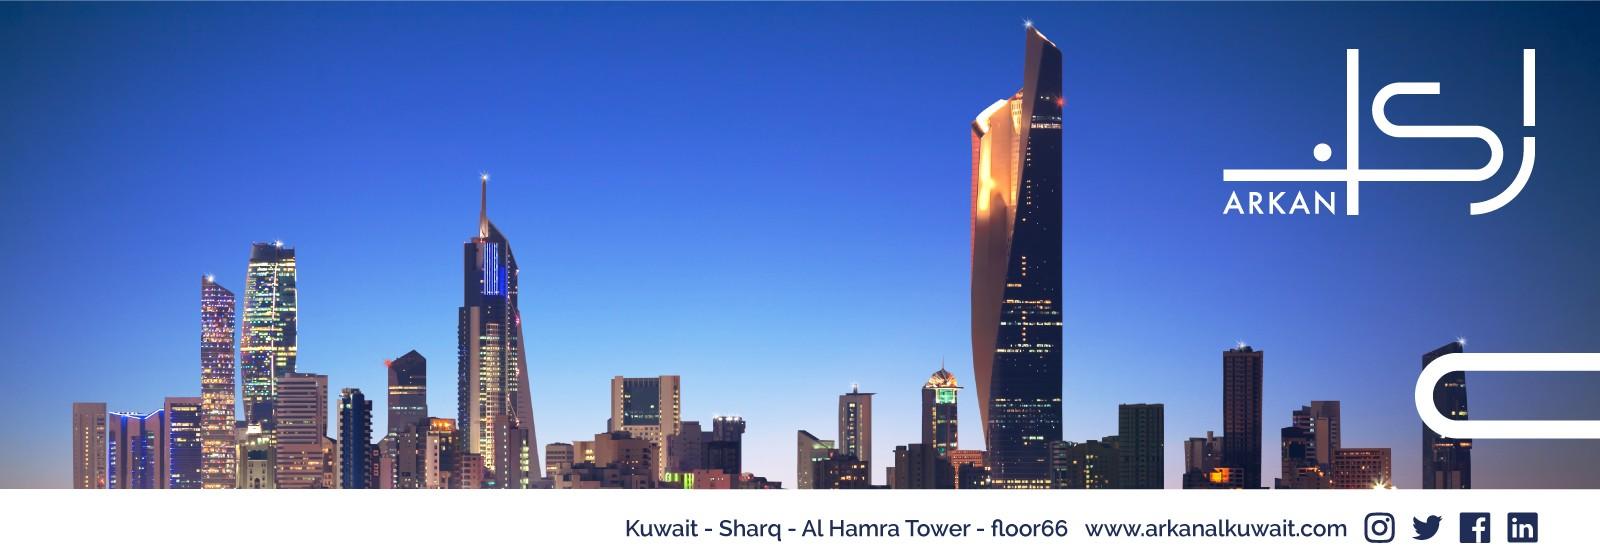 Arkan Al Kuwait Real Estate Company   LinkedIn